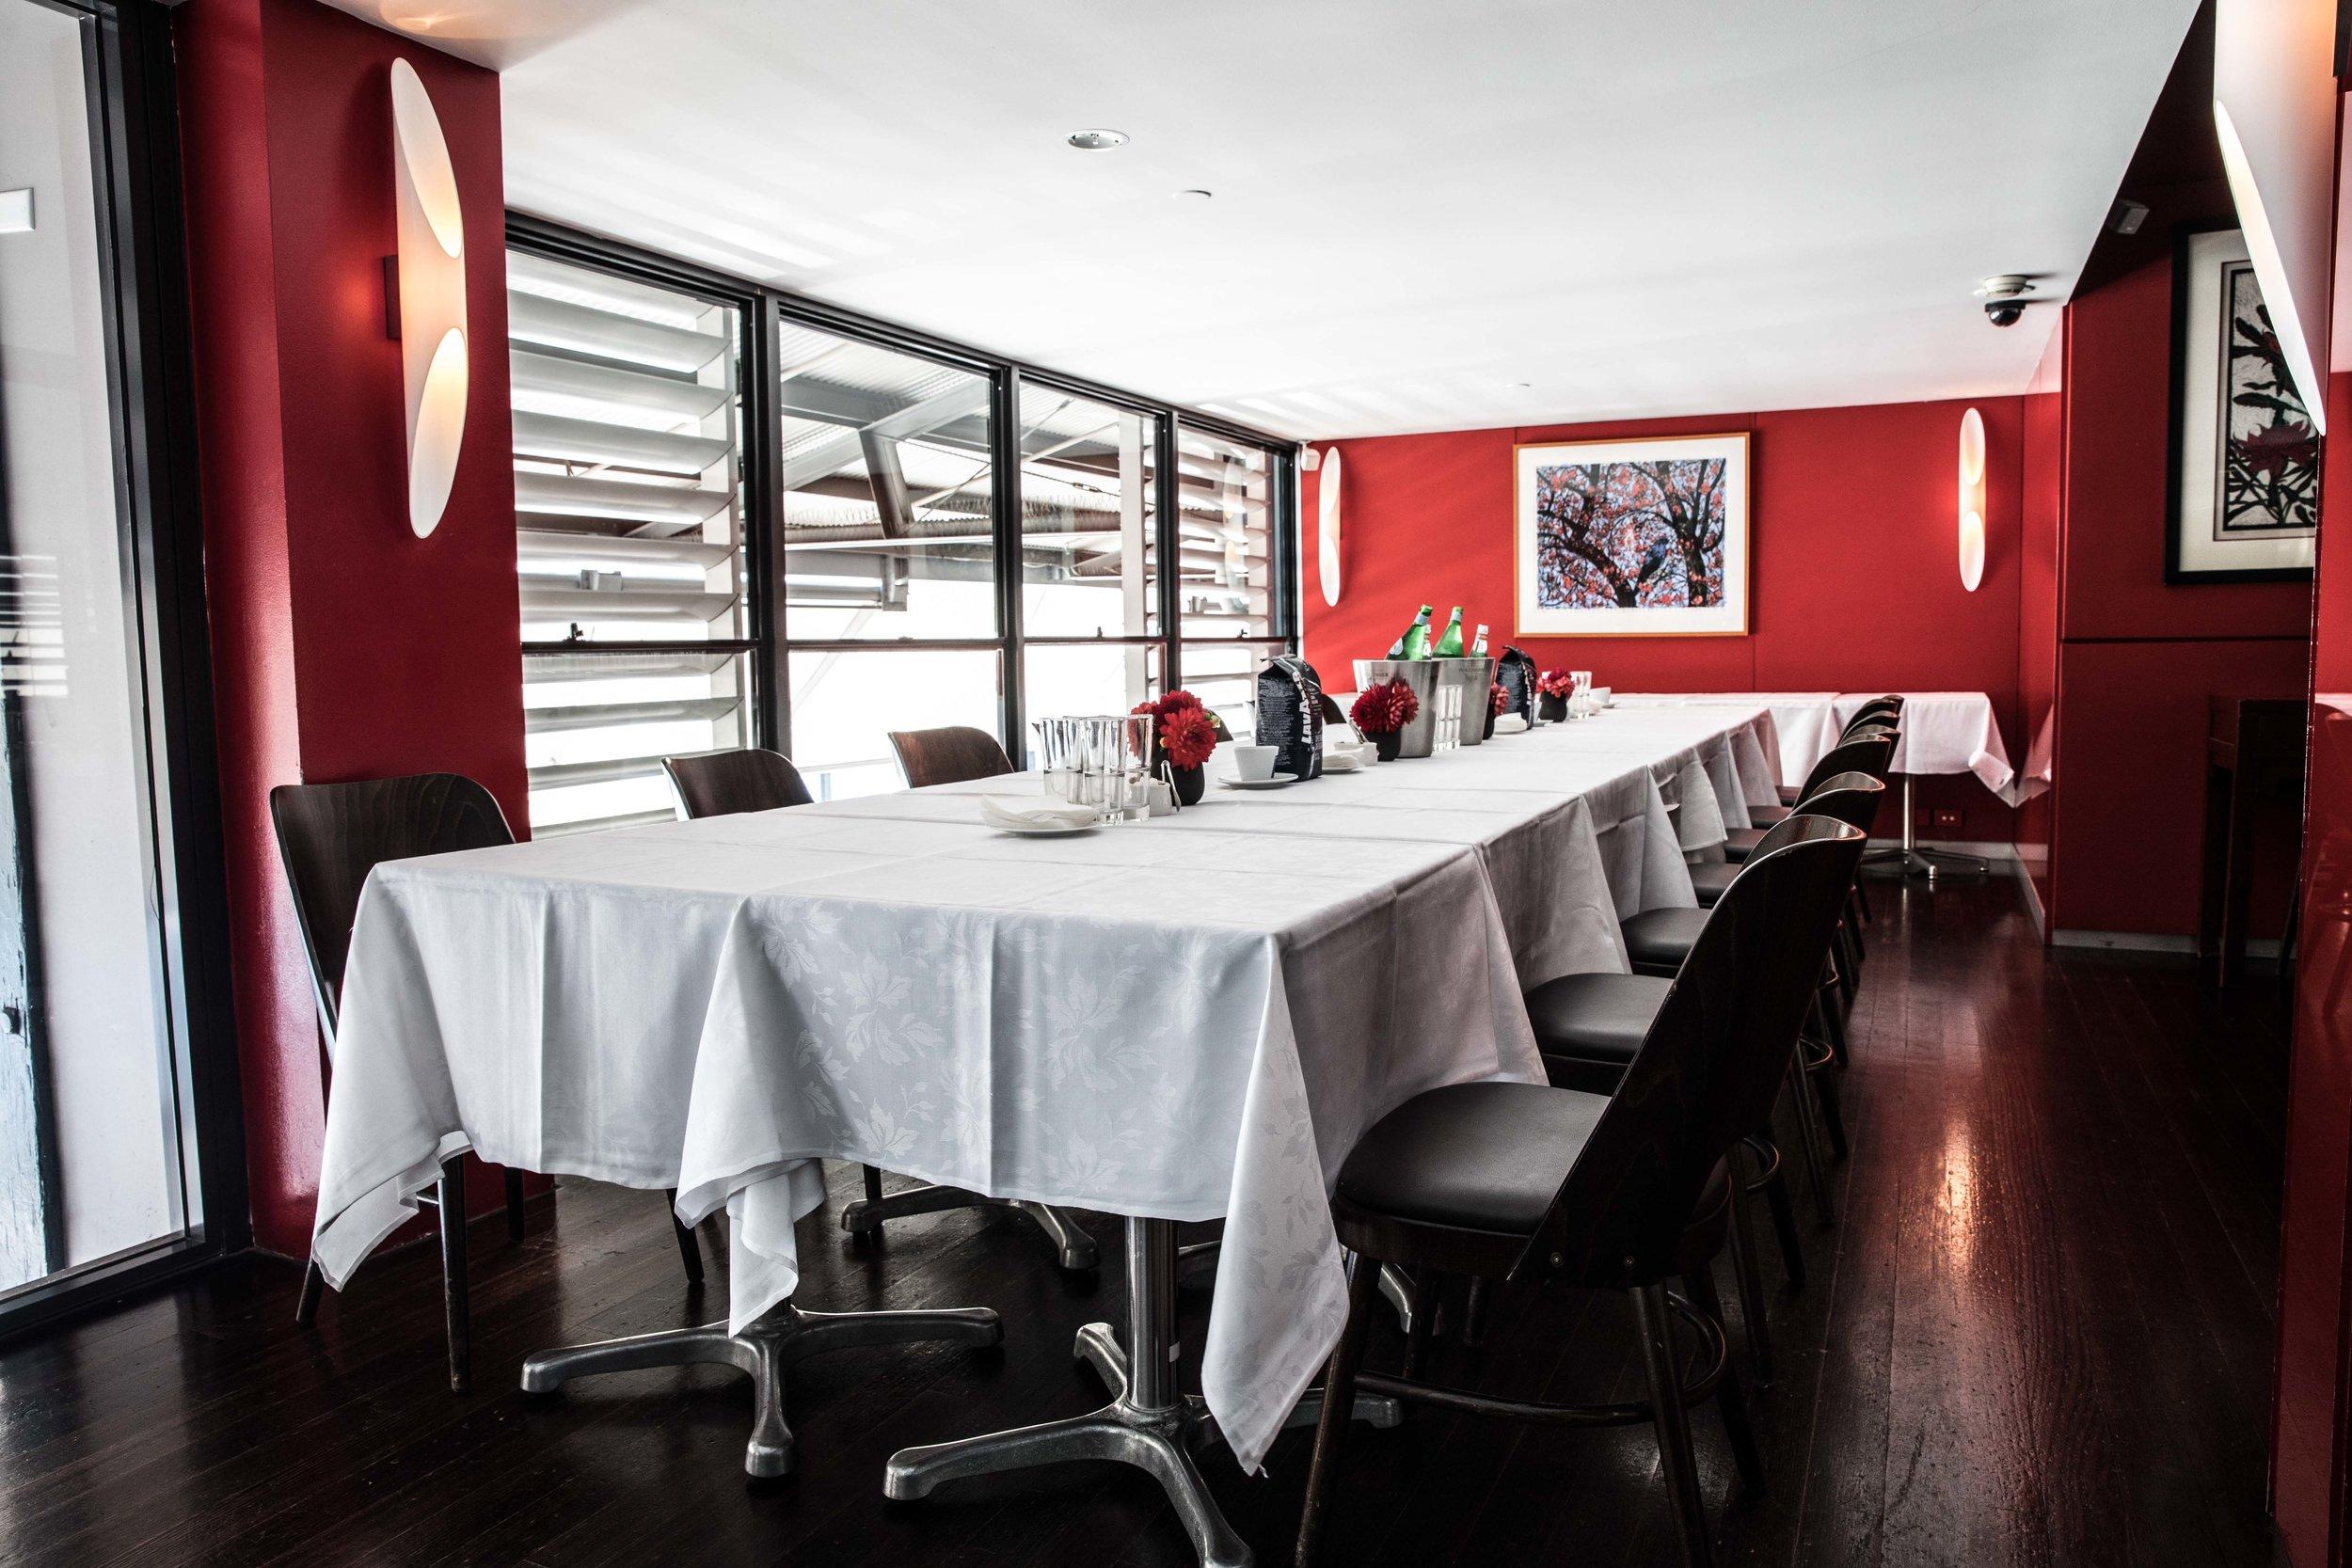 lavazza-massimo-bottura-worlds-50-best-restaurants-awards-2017-otto-media-room-1.jpg